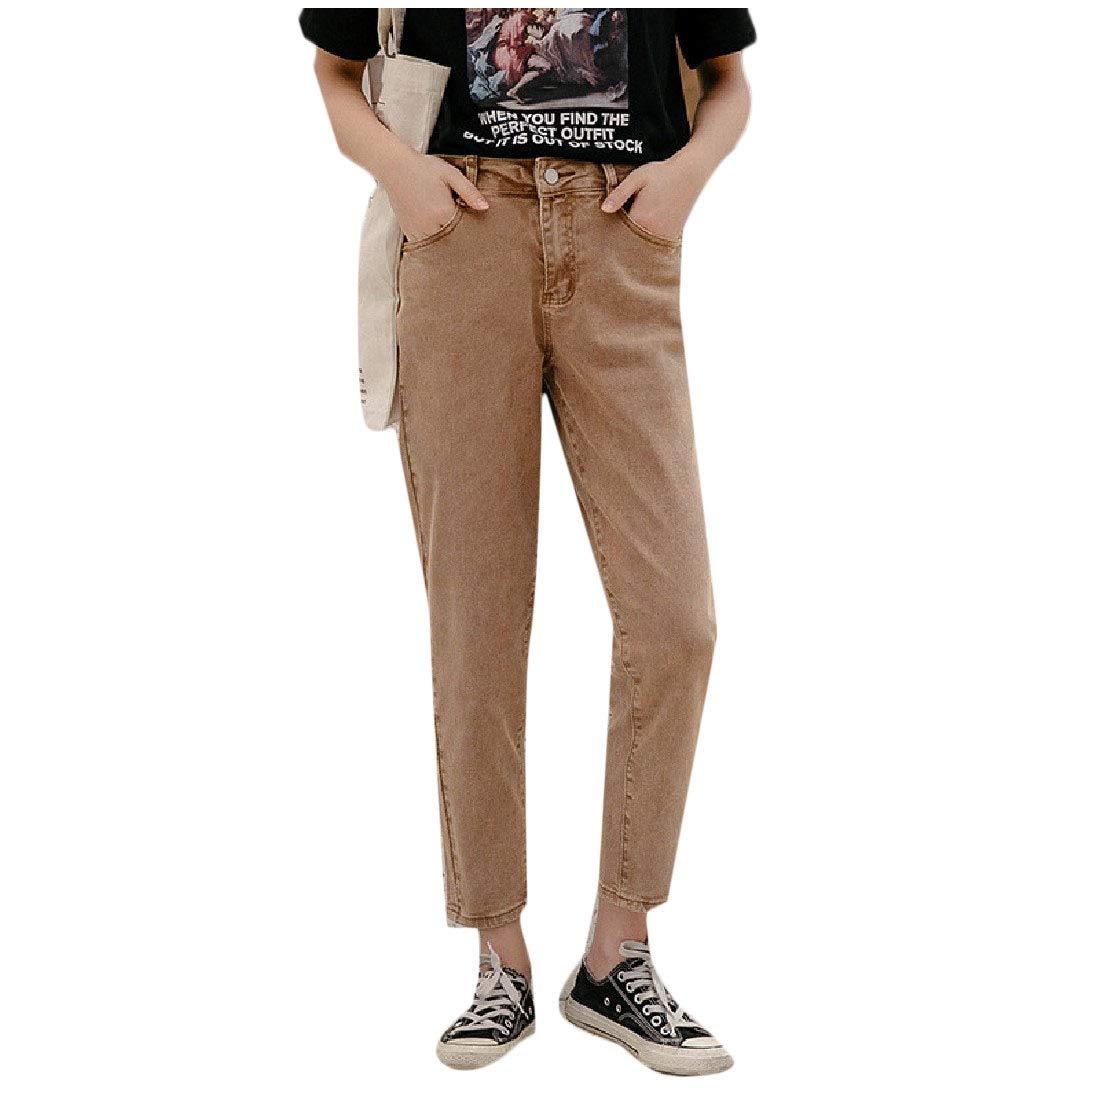 Vska Women Loose Fashion Solid Color High Waist Jean